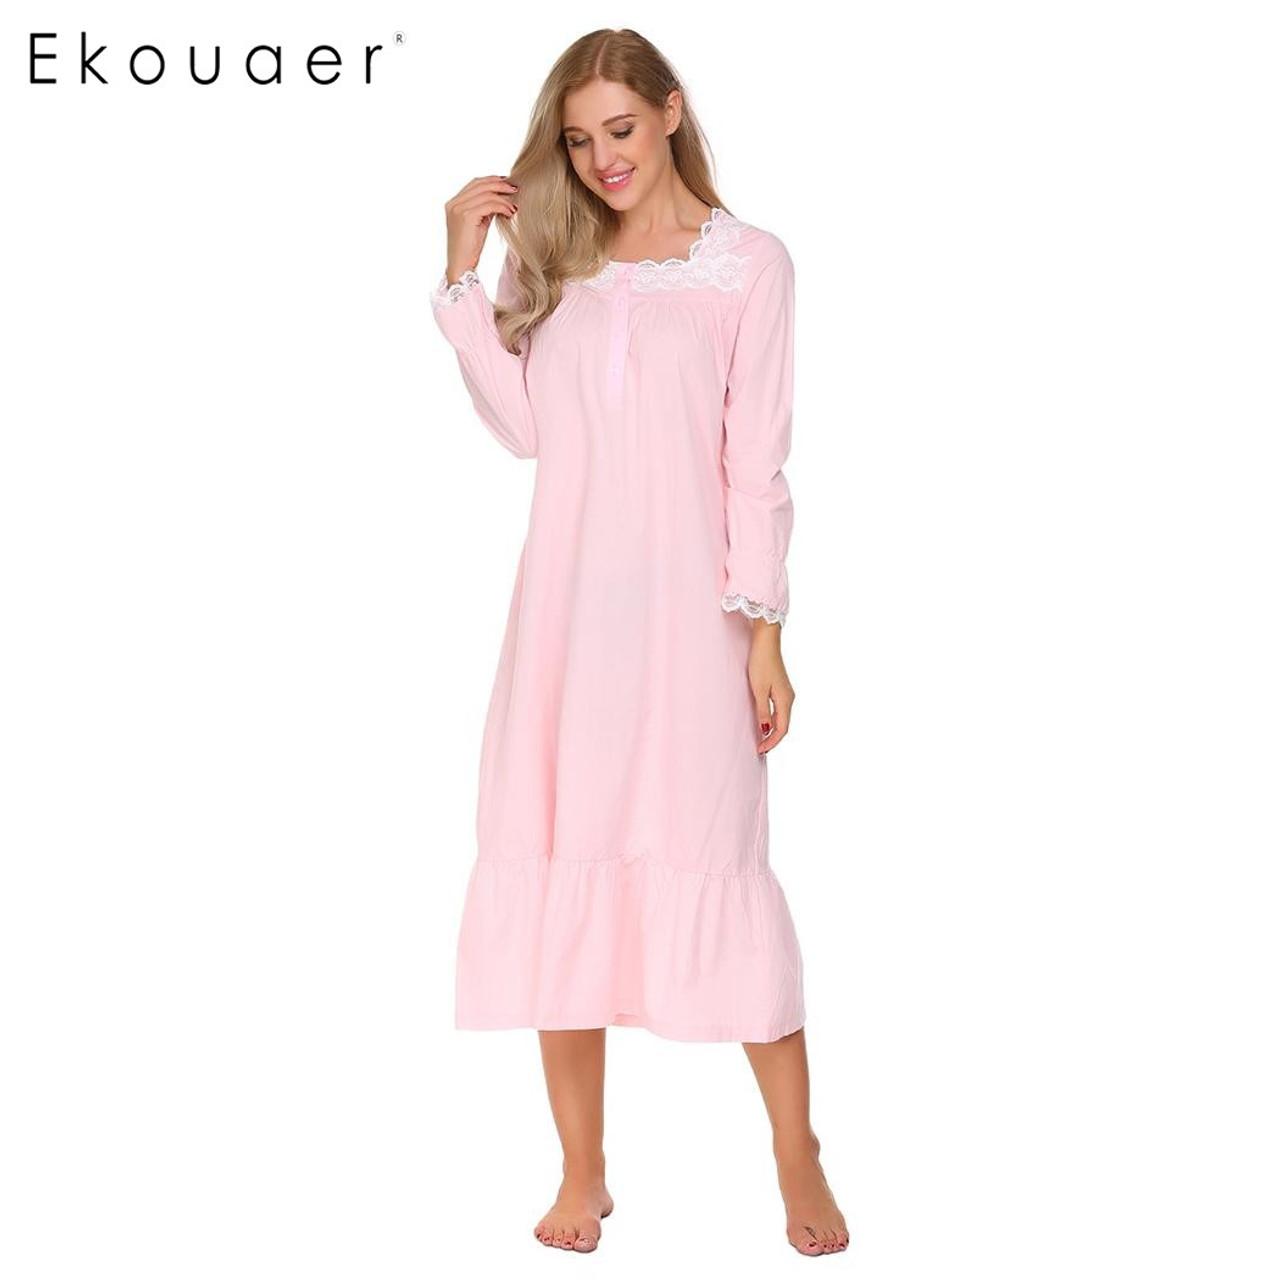 Ekouaer Elegant Solid Nightwear Womens Victorian Long Sleeve Sleepwear Lace  Patchwork Ruffled Hem Nightgown Plus Size - OnshopDeals.Com 69d0c22ed